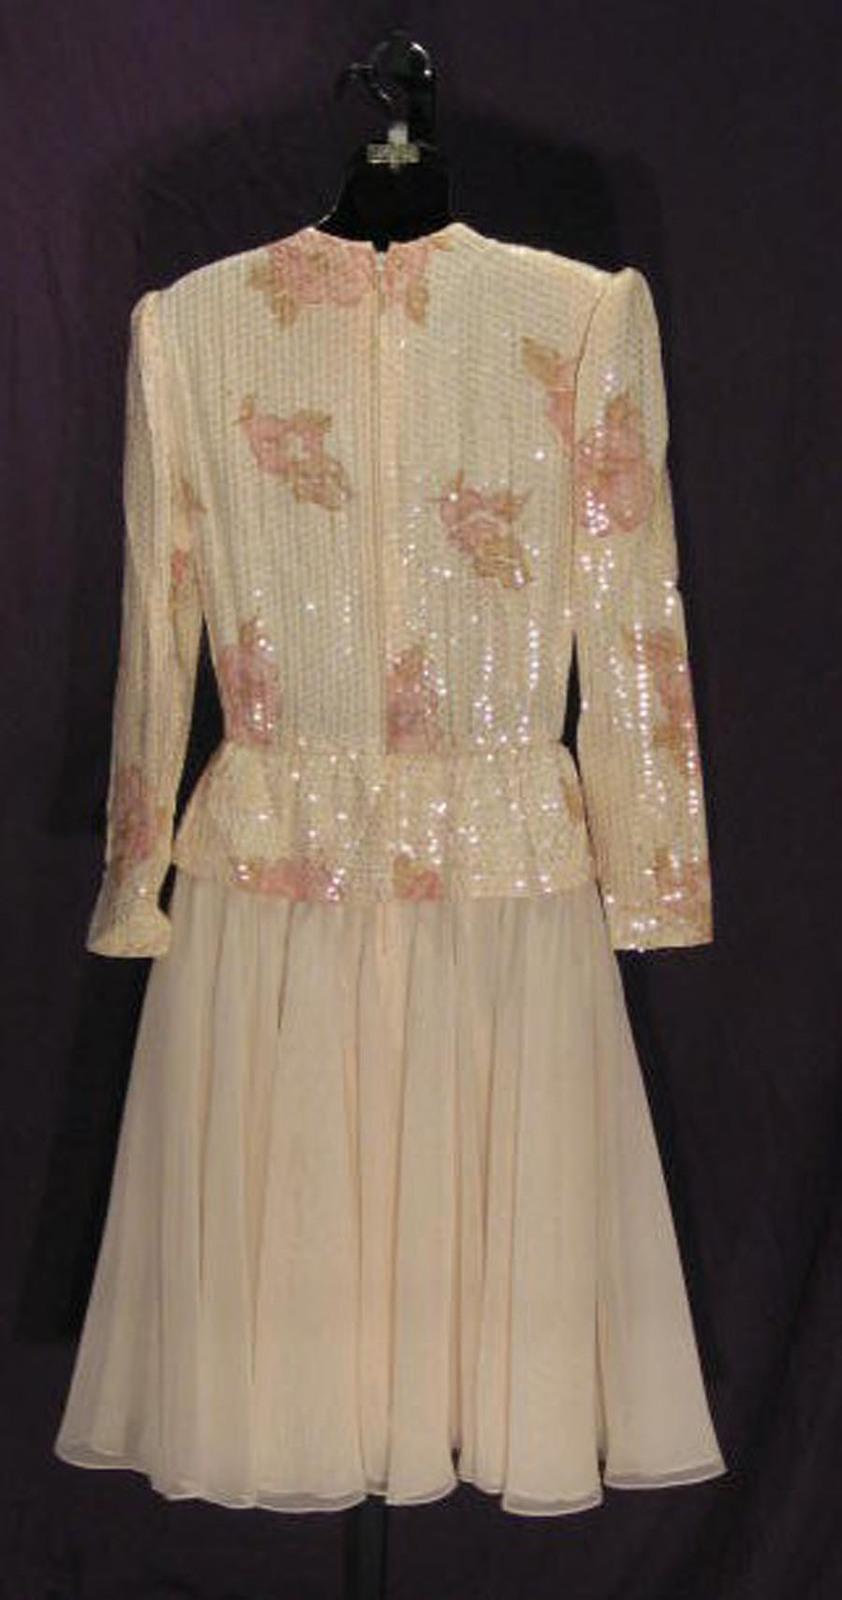 VTG Estevez Cotton Blend Pink Mock Wrap Sequin Organza Evening Dress Size 10